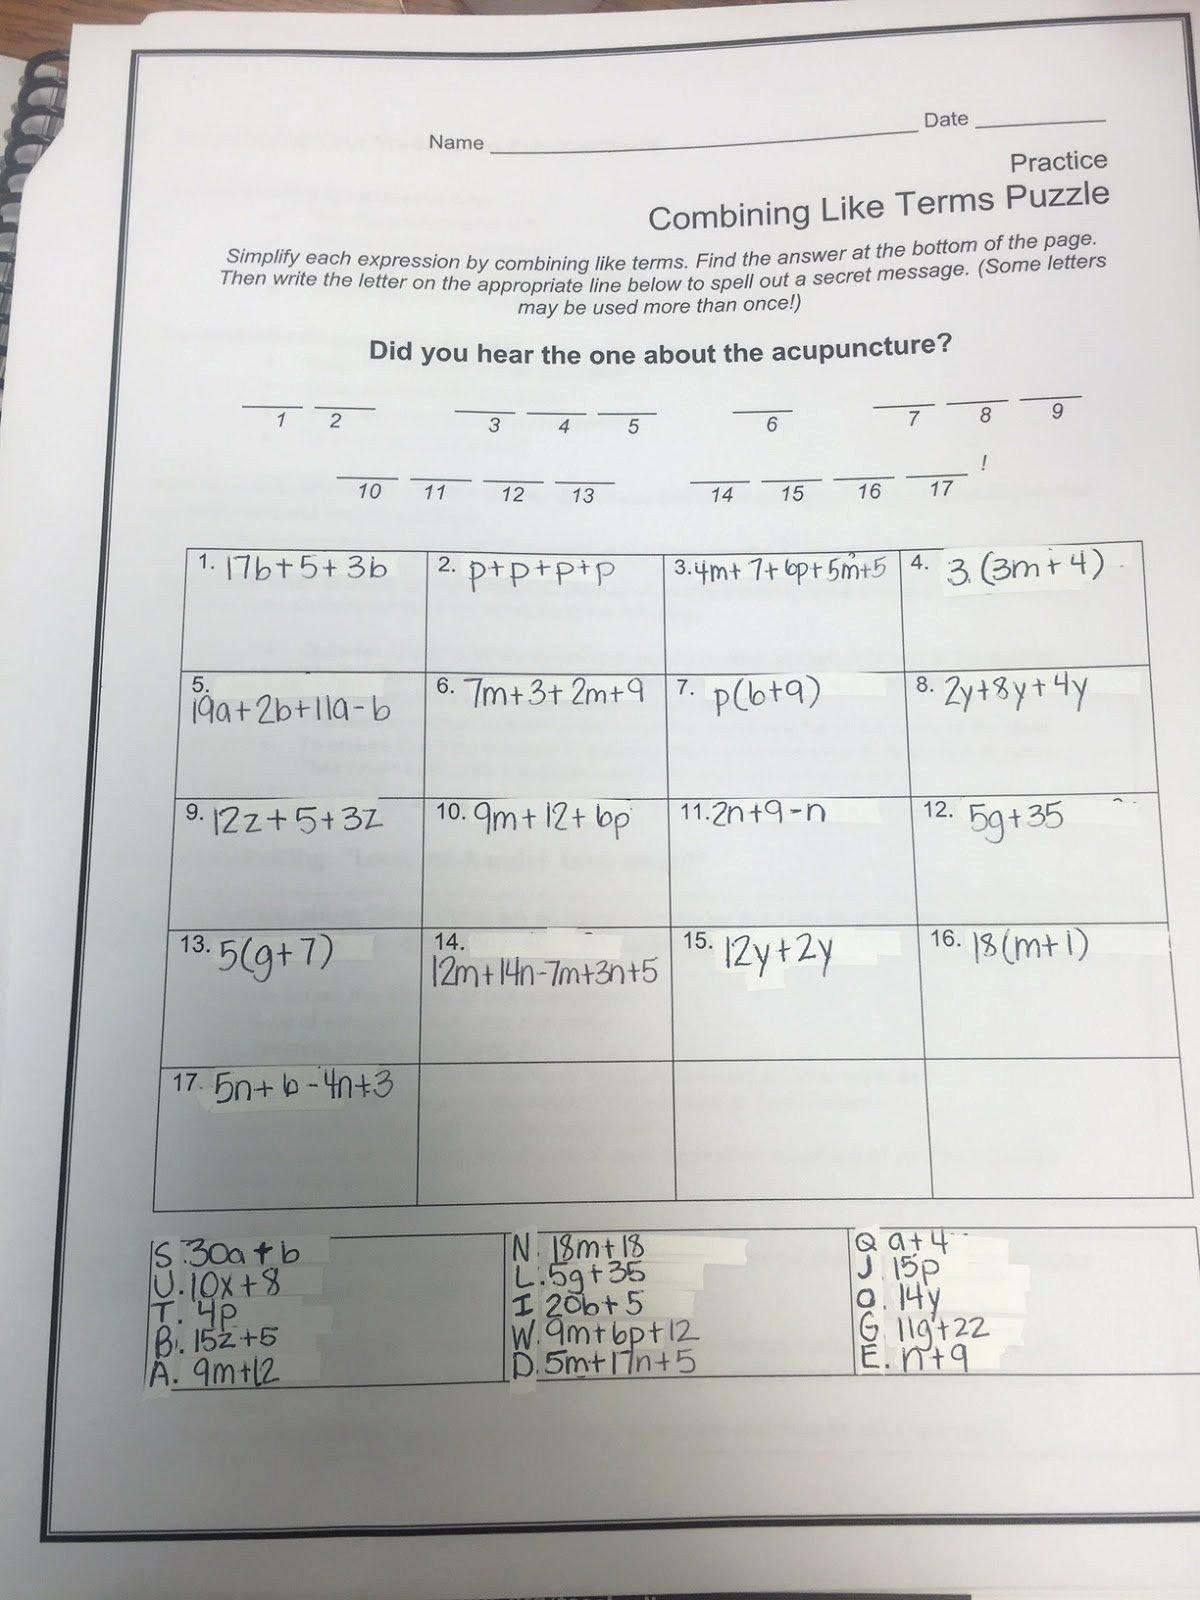 Combining Like Terms Practice Worksheet Best Of Bining Like Terms Coloring Worksheet